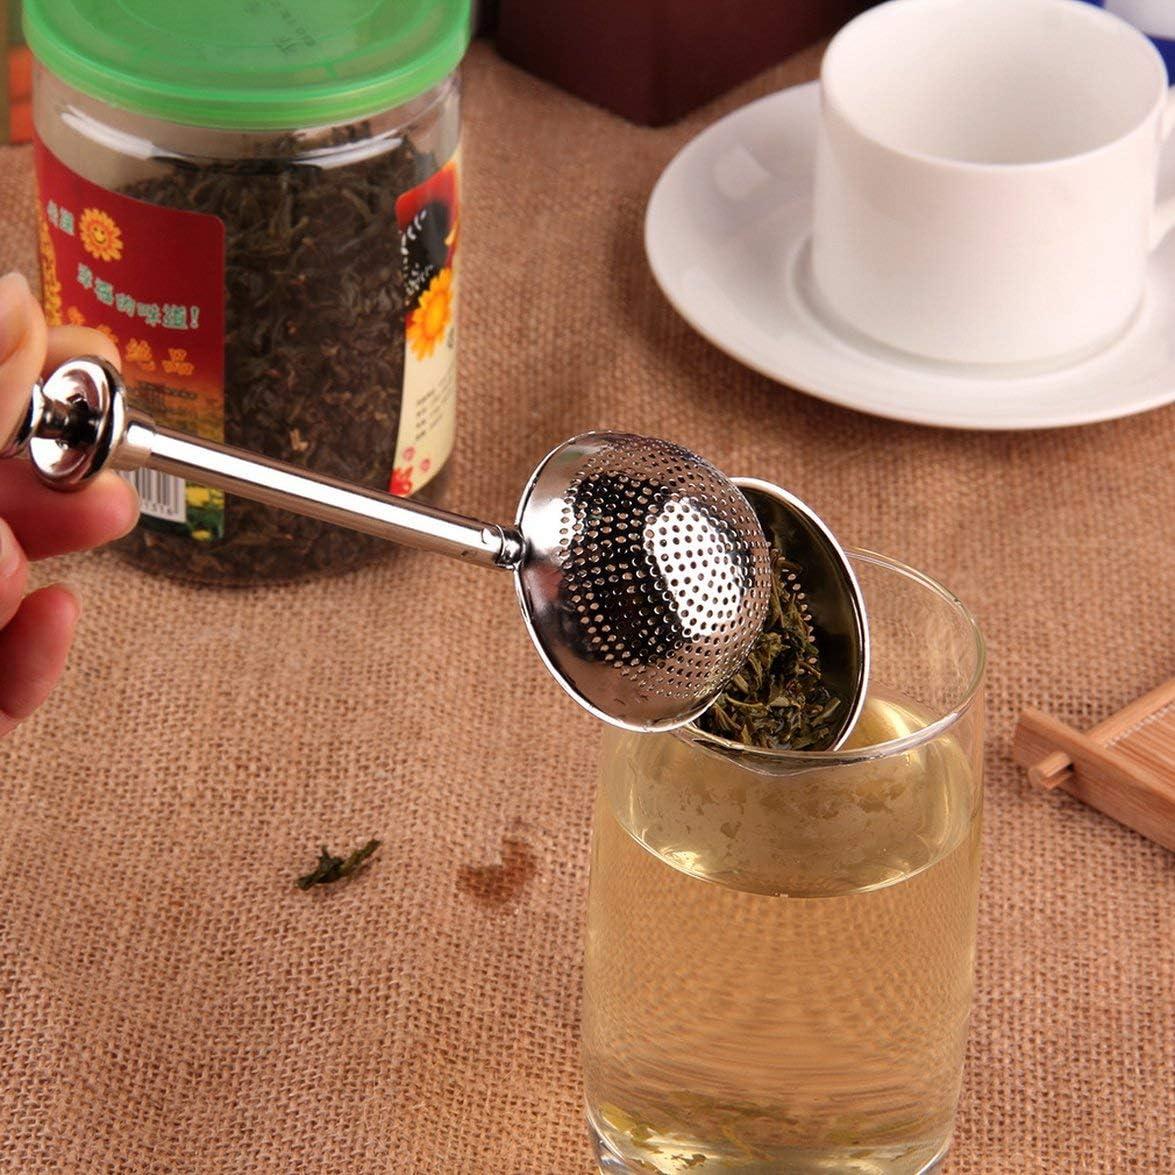 MqbY Filter PREUP Stainless Steel Tea Mesh Teaspoon Tea Infuser Reusable Strainer Loose Tea Leaf Herbal Stainless Steel Filter Tea Strainer